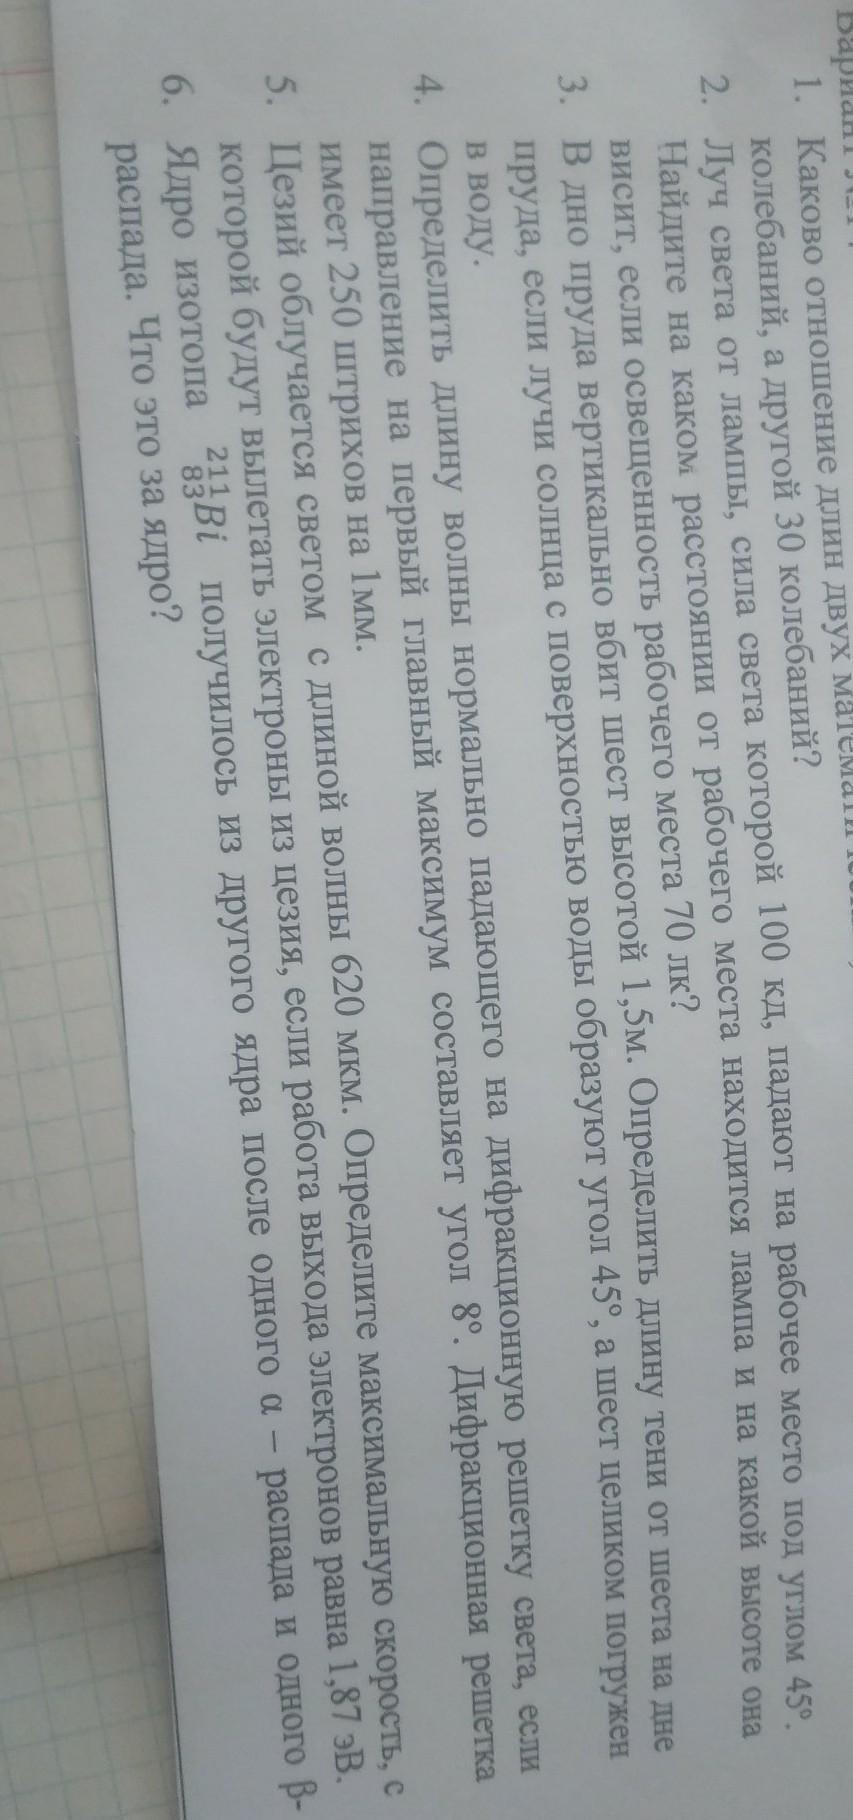 Физика 80 баллов. СРОЧНО .любые 2-3 задачи кроме 1